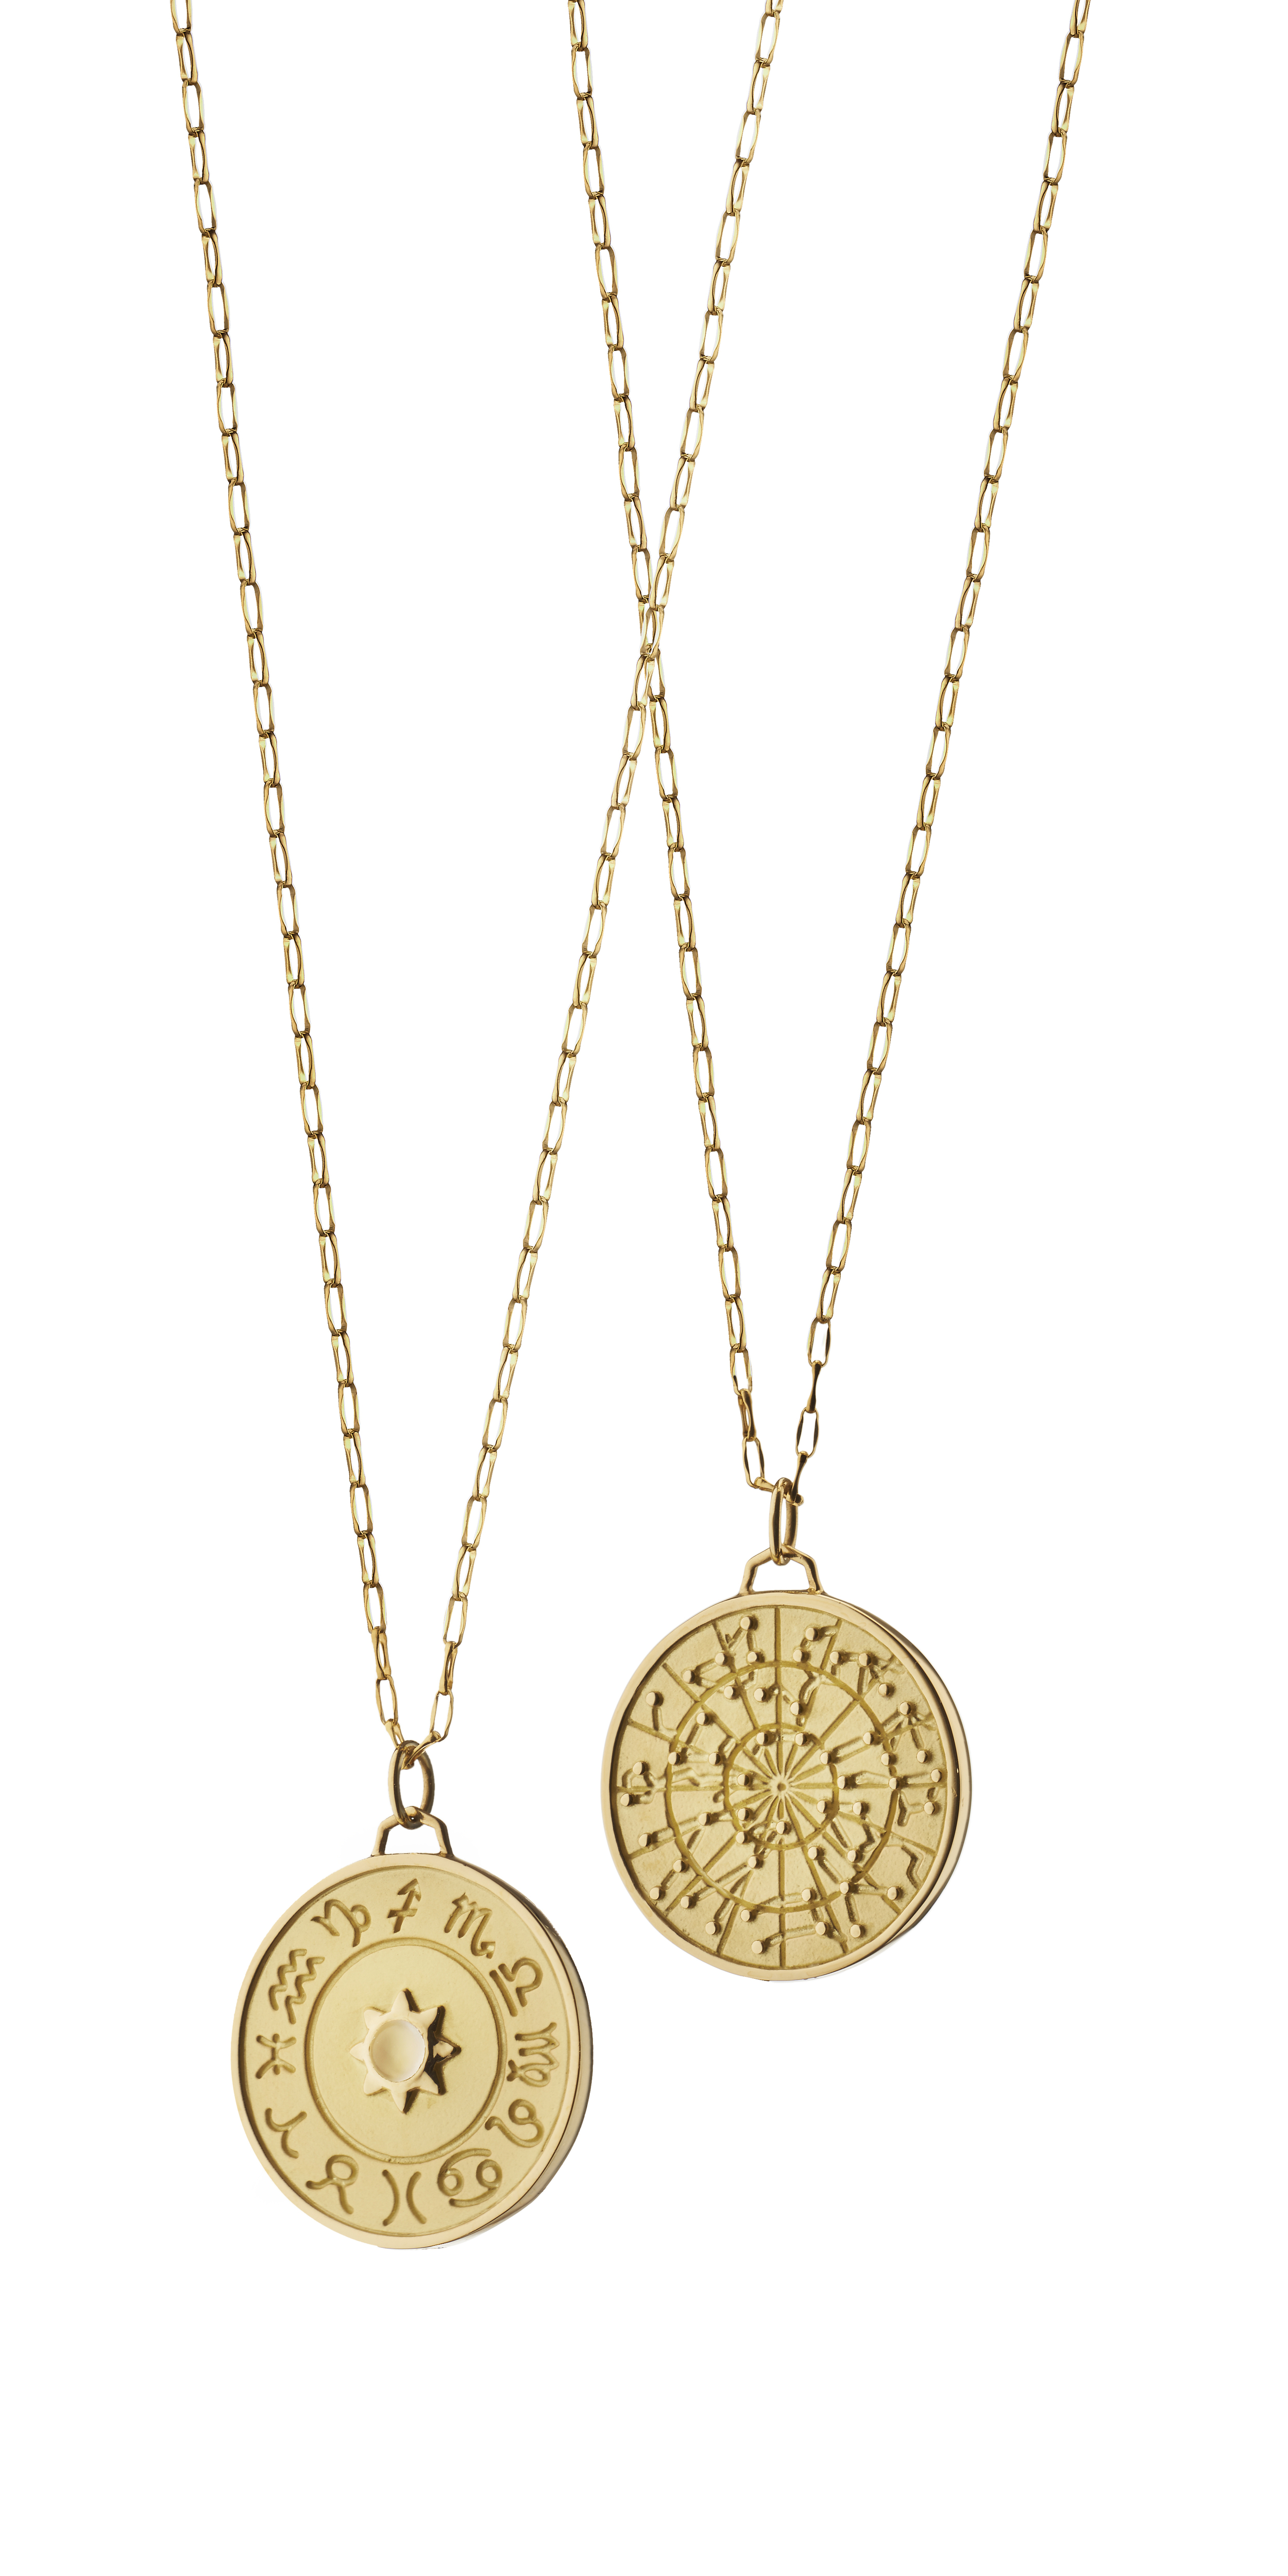 More newness -- Zodiac pendants in 18k yellow gold.